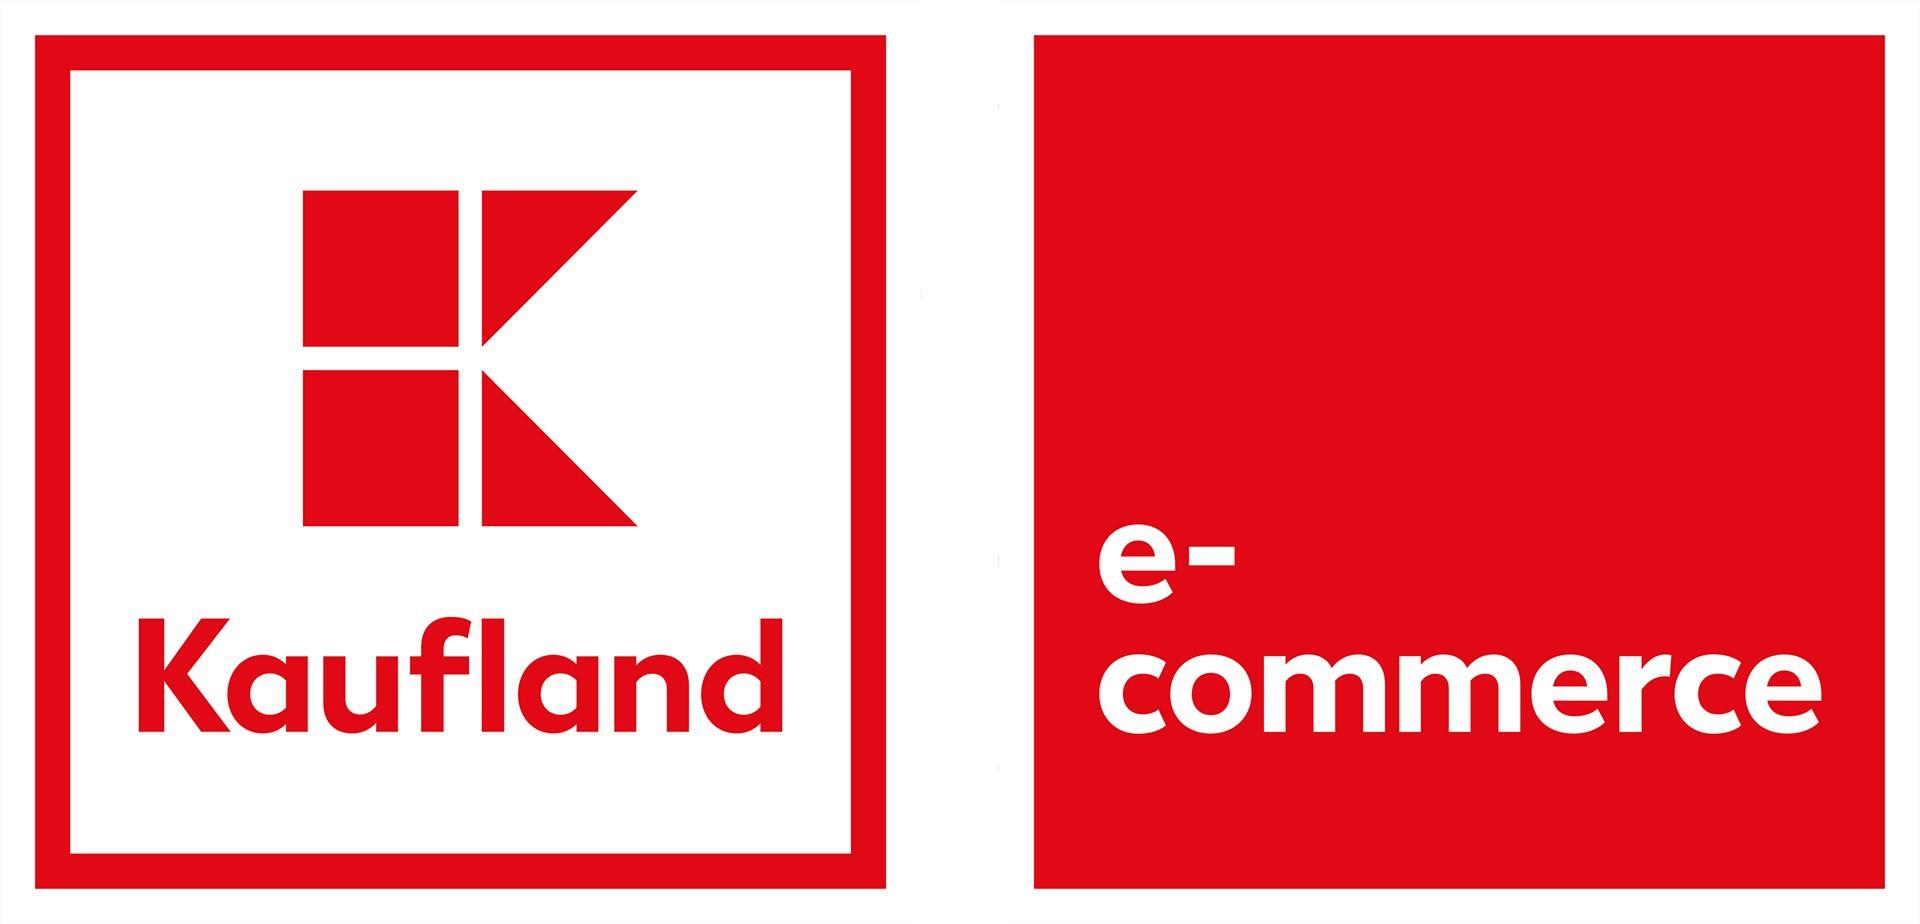 Bildmarke: K Kaufland e-commerce